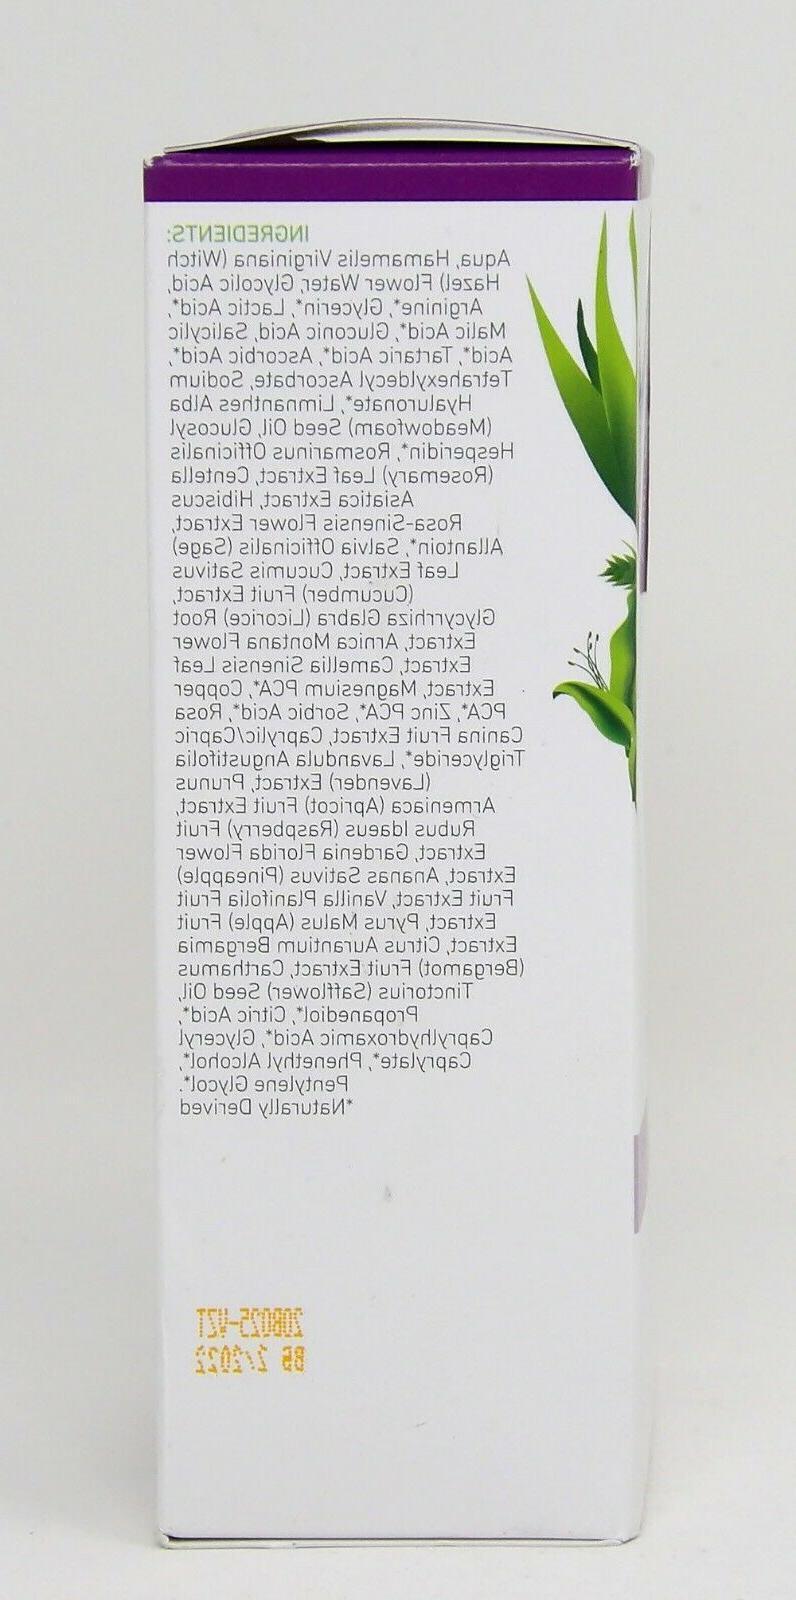 Instanatural Glycolic 7% Vitamin Anti-Aging